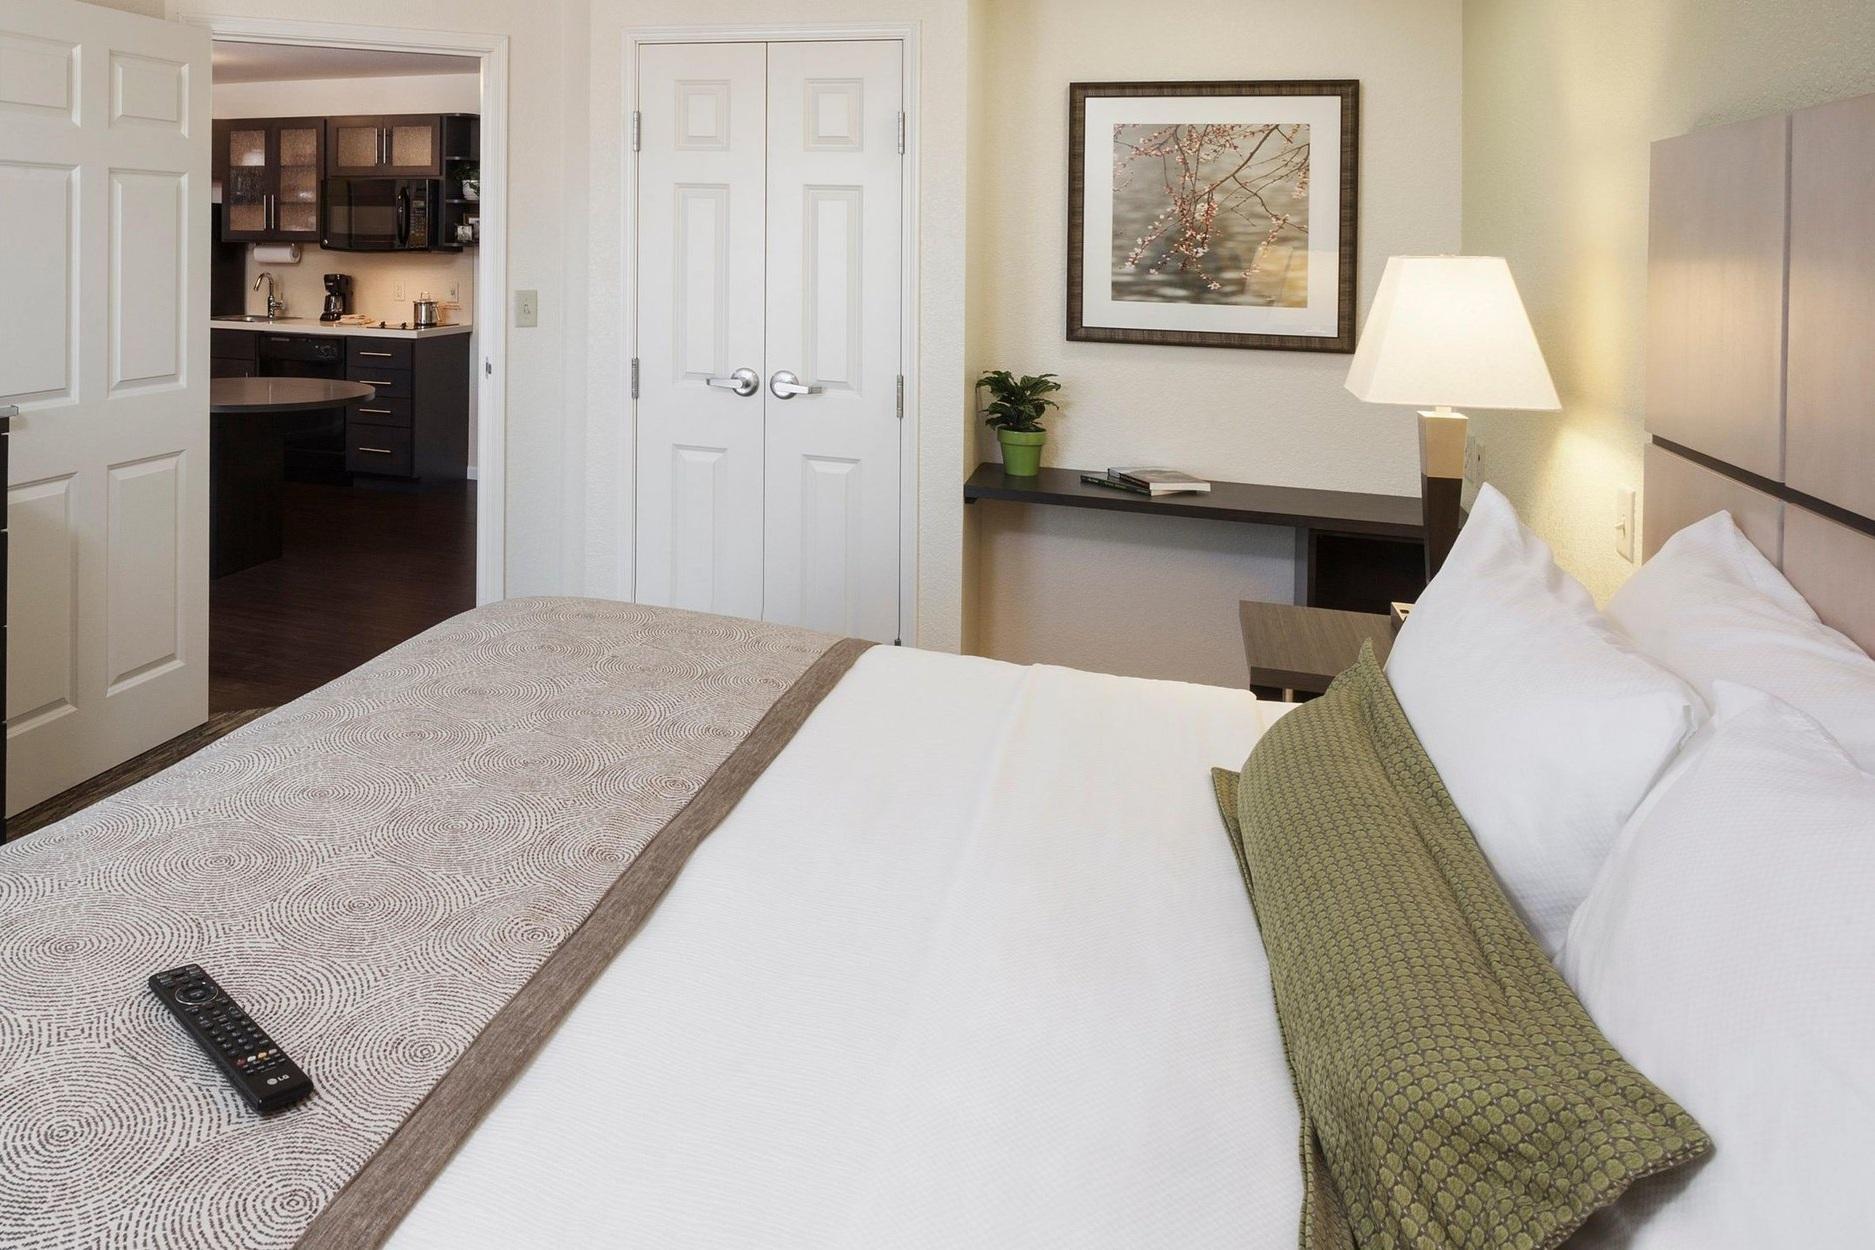 candlewood-suites-houston-4775947990-2x1.jpg